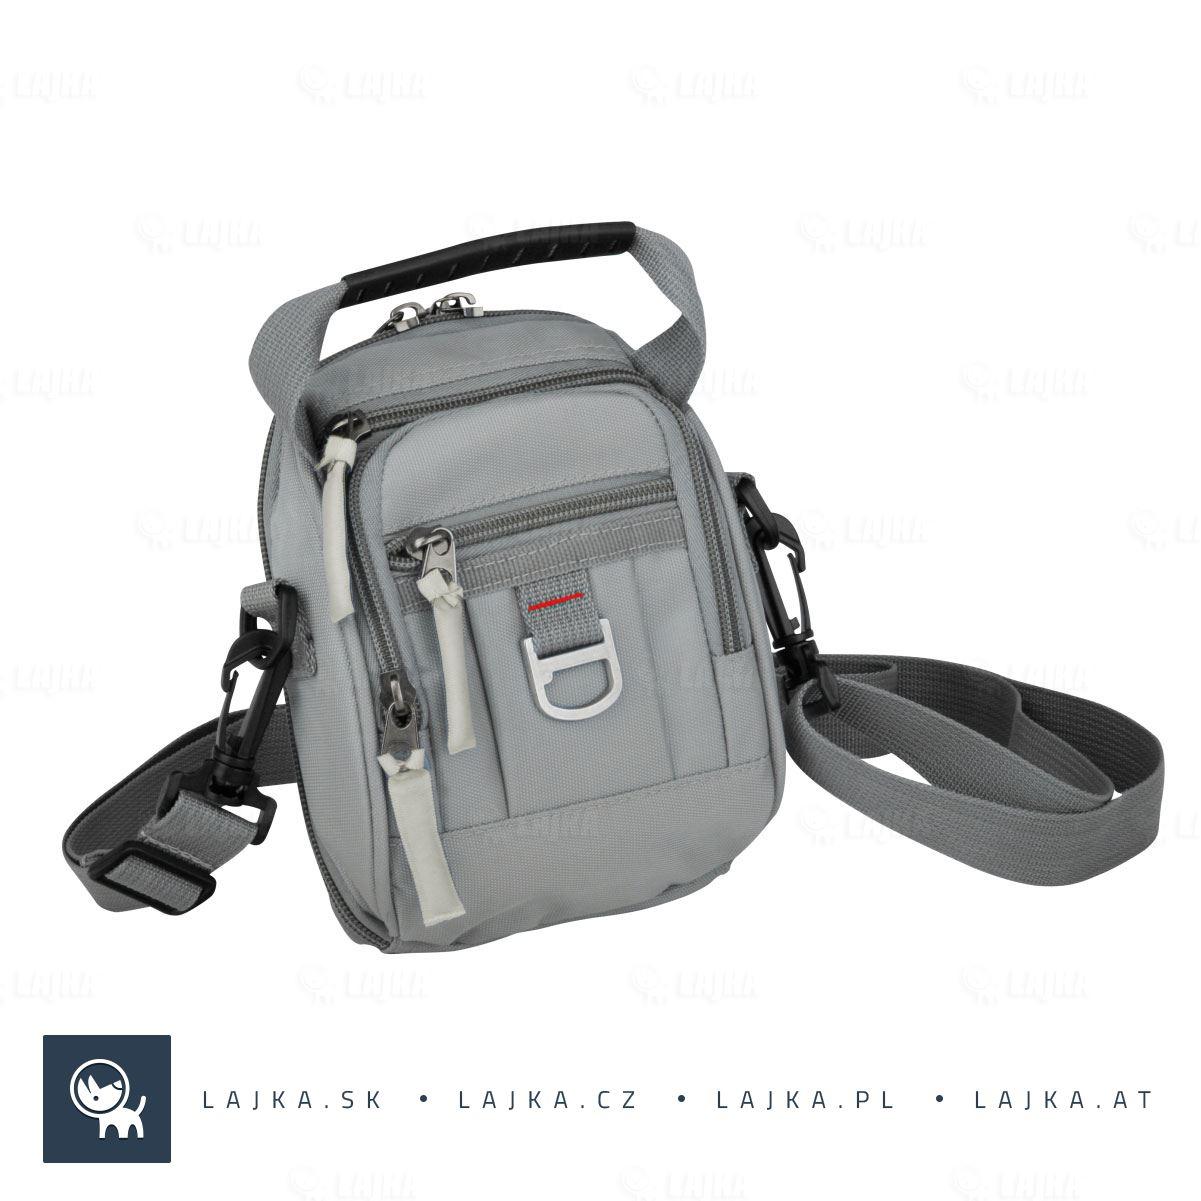 Otis taška na doklady dfbd9561a3a